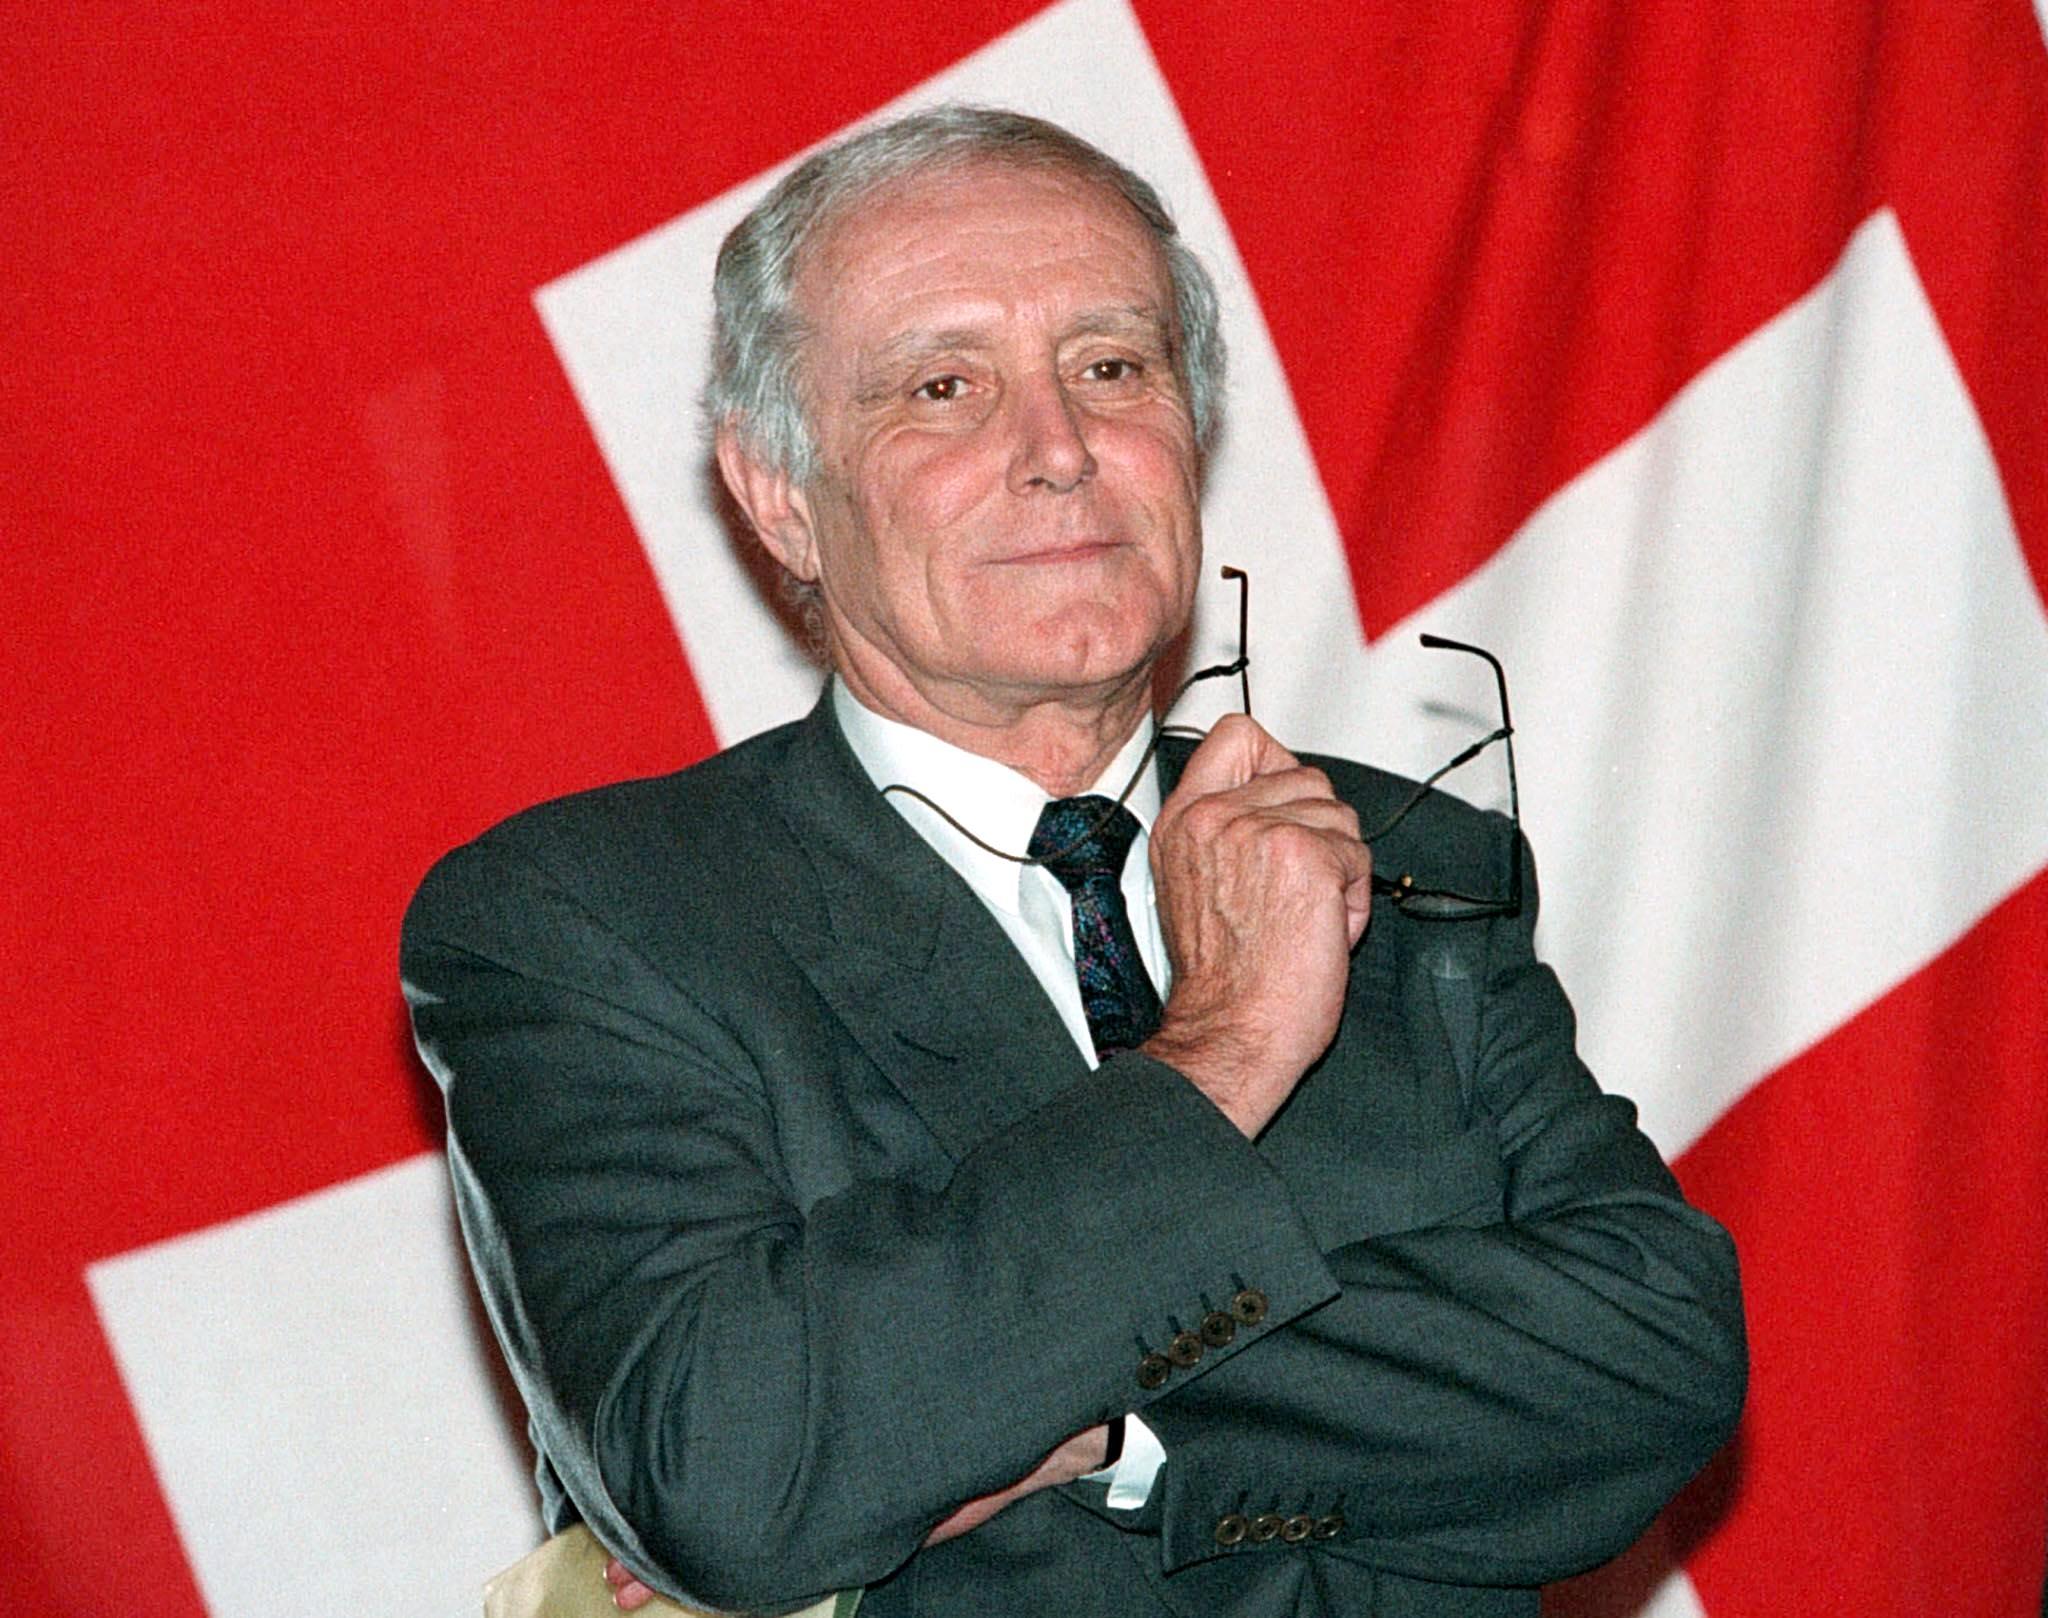 Muere el expresidente suizo Flavio Cotti de covid-19